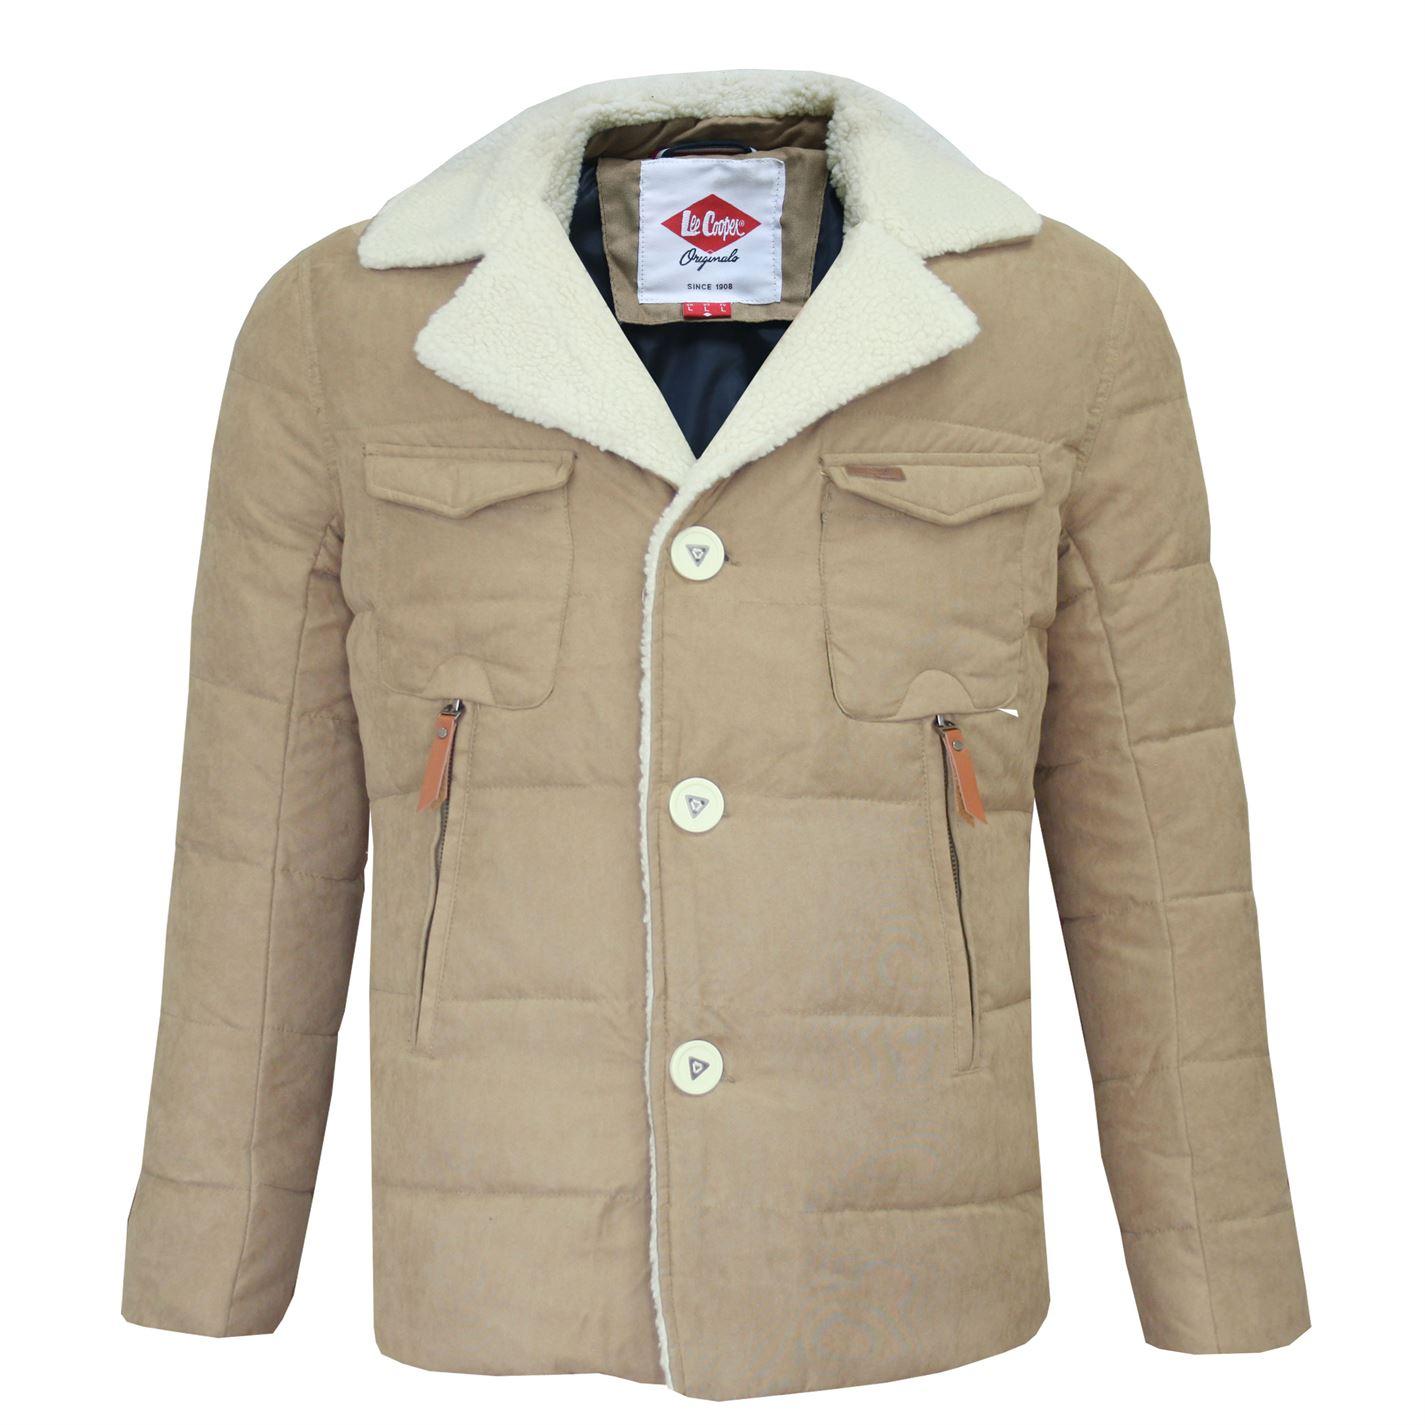 ... Lee Cooper Sherpa Collar Pánská bunda. -10% -76% ccf79aebac